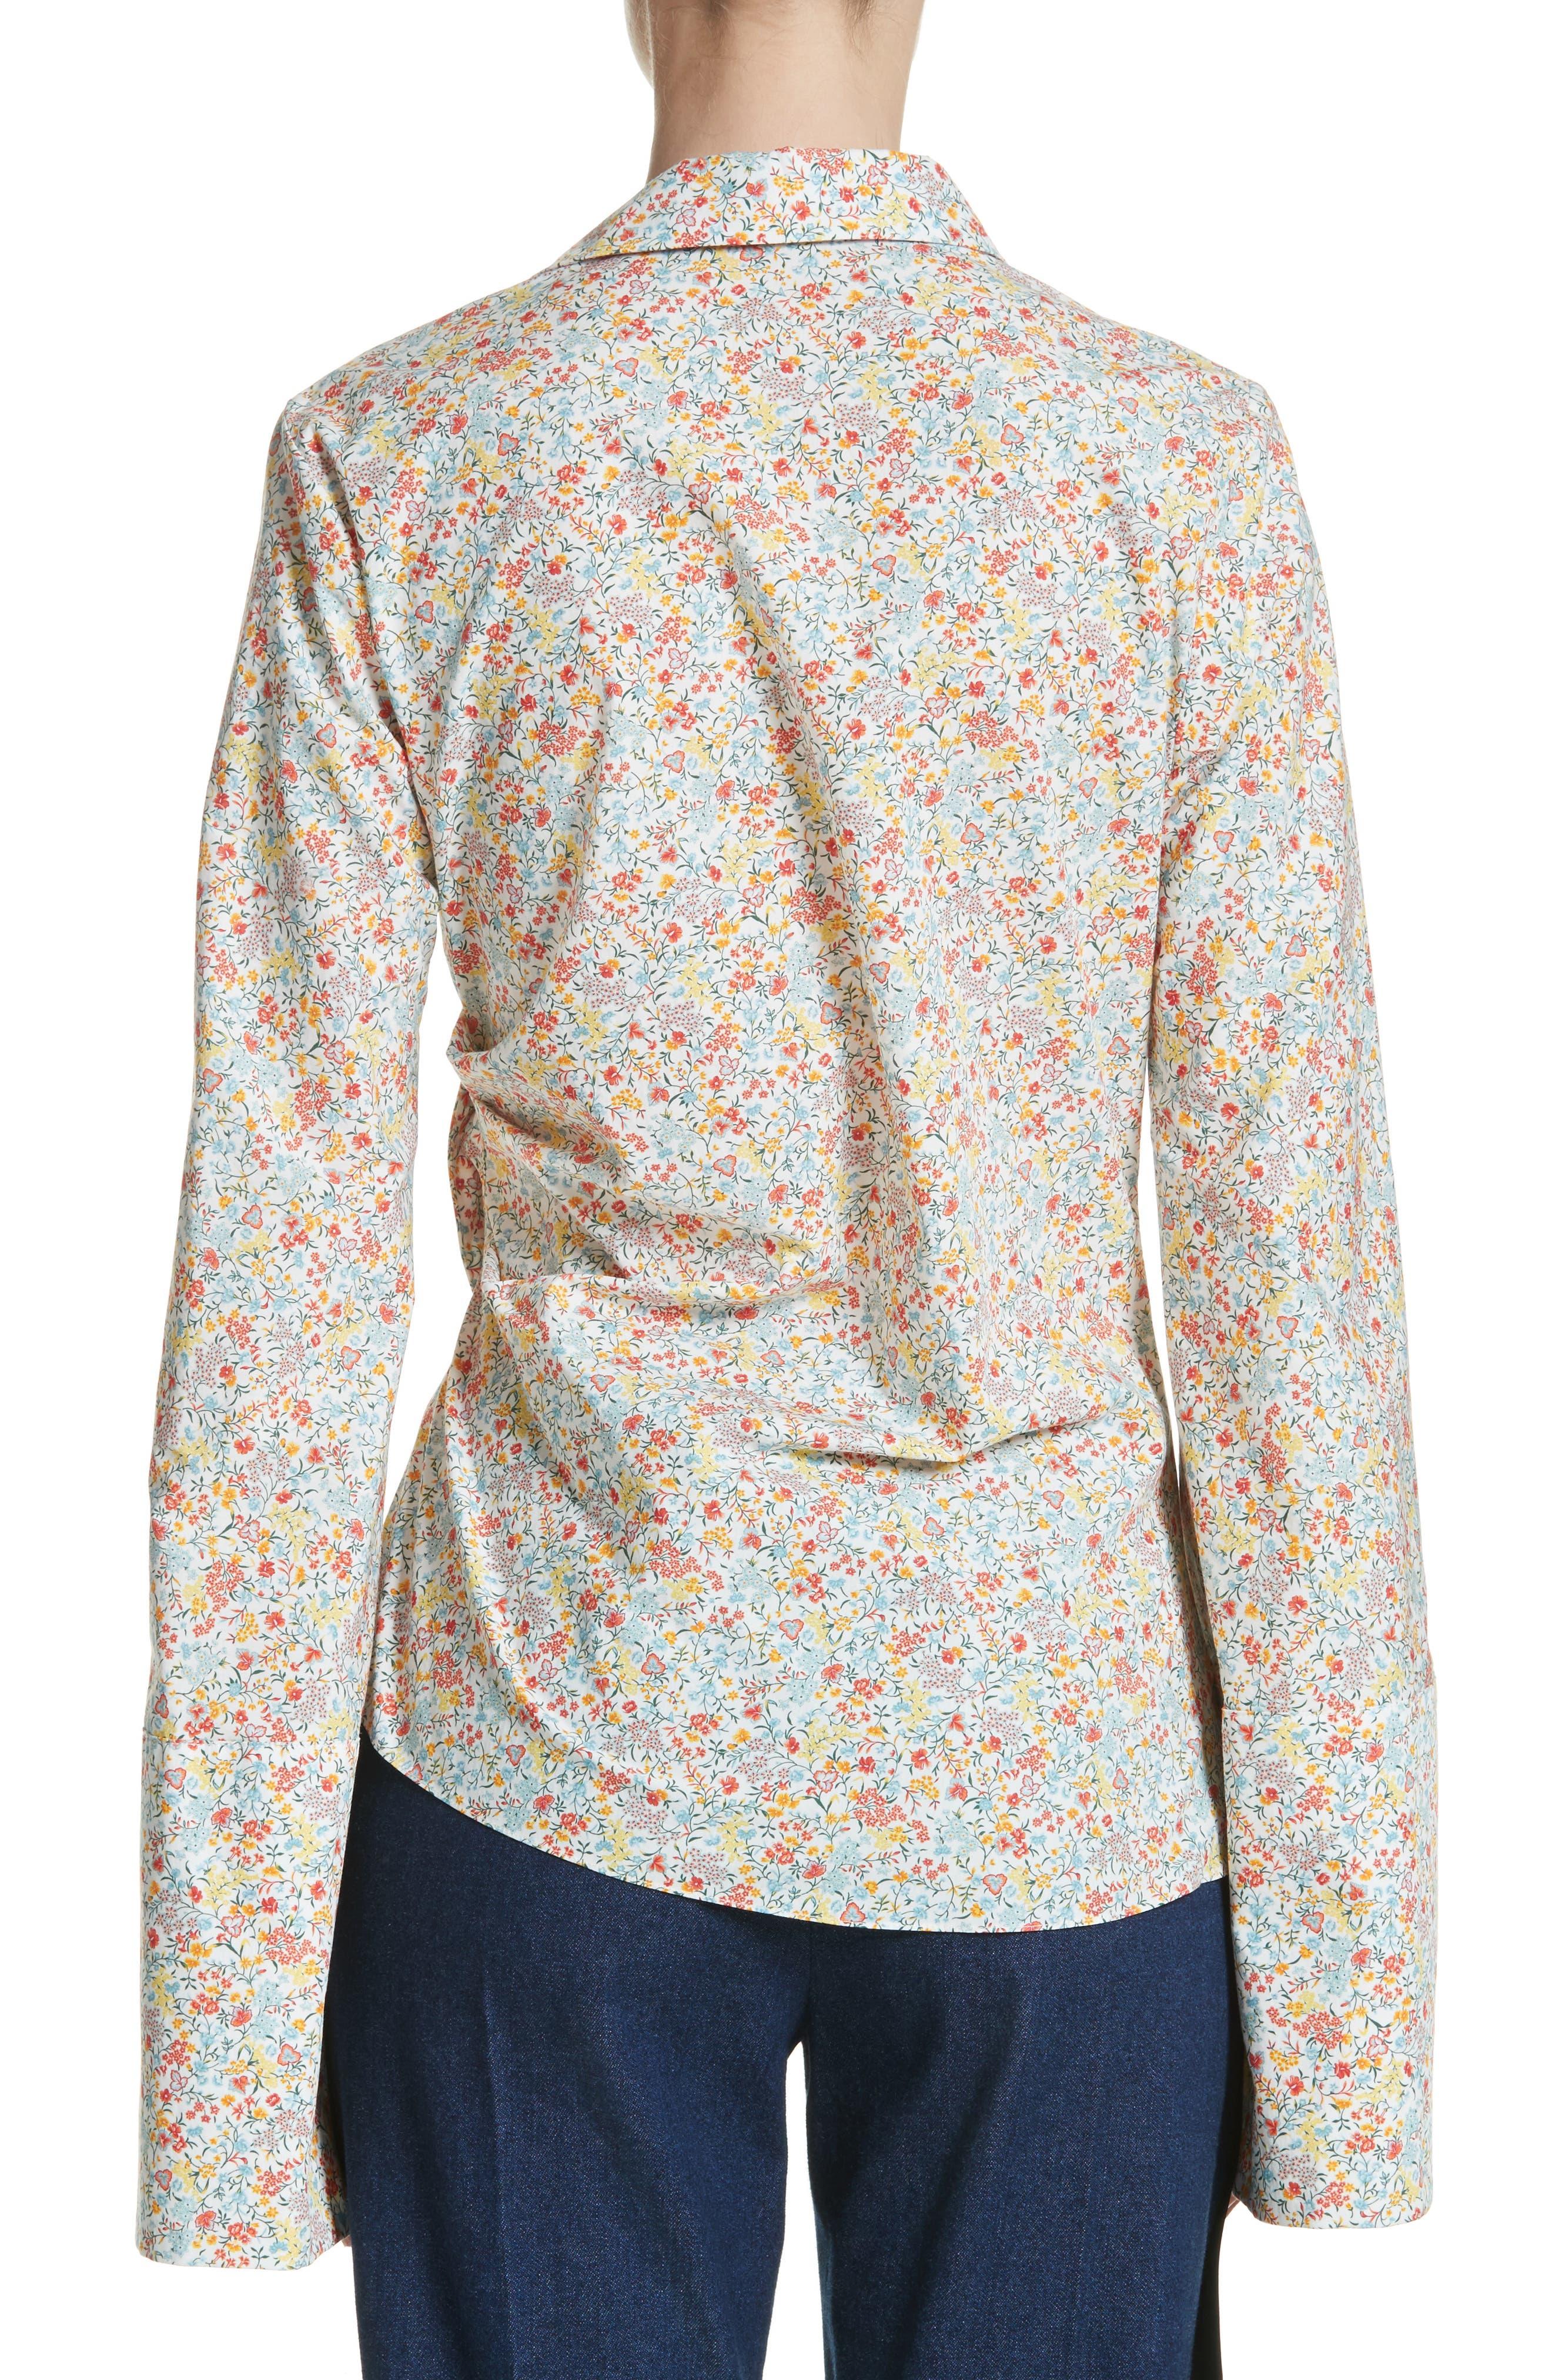 Wyatt Asymmetrical Cotton Blouse,                             Alternate thumbnail 2, color,                             Multicolor